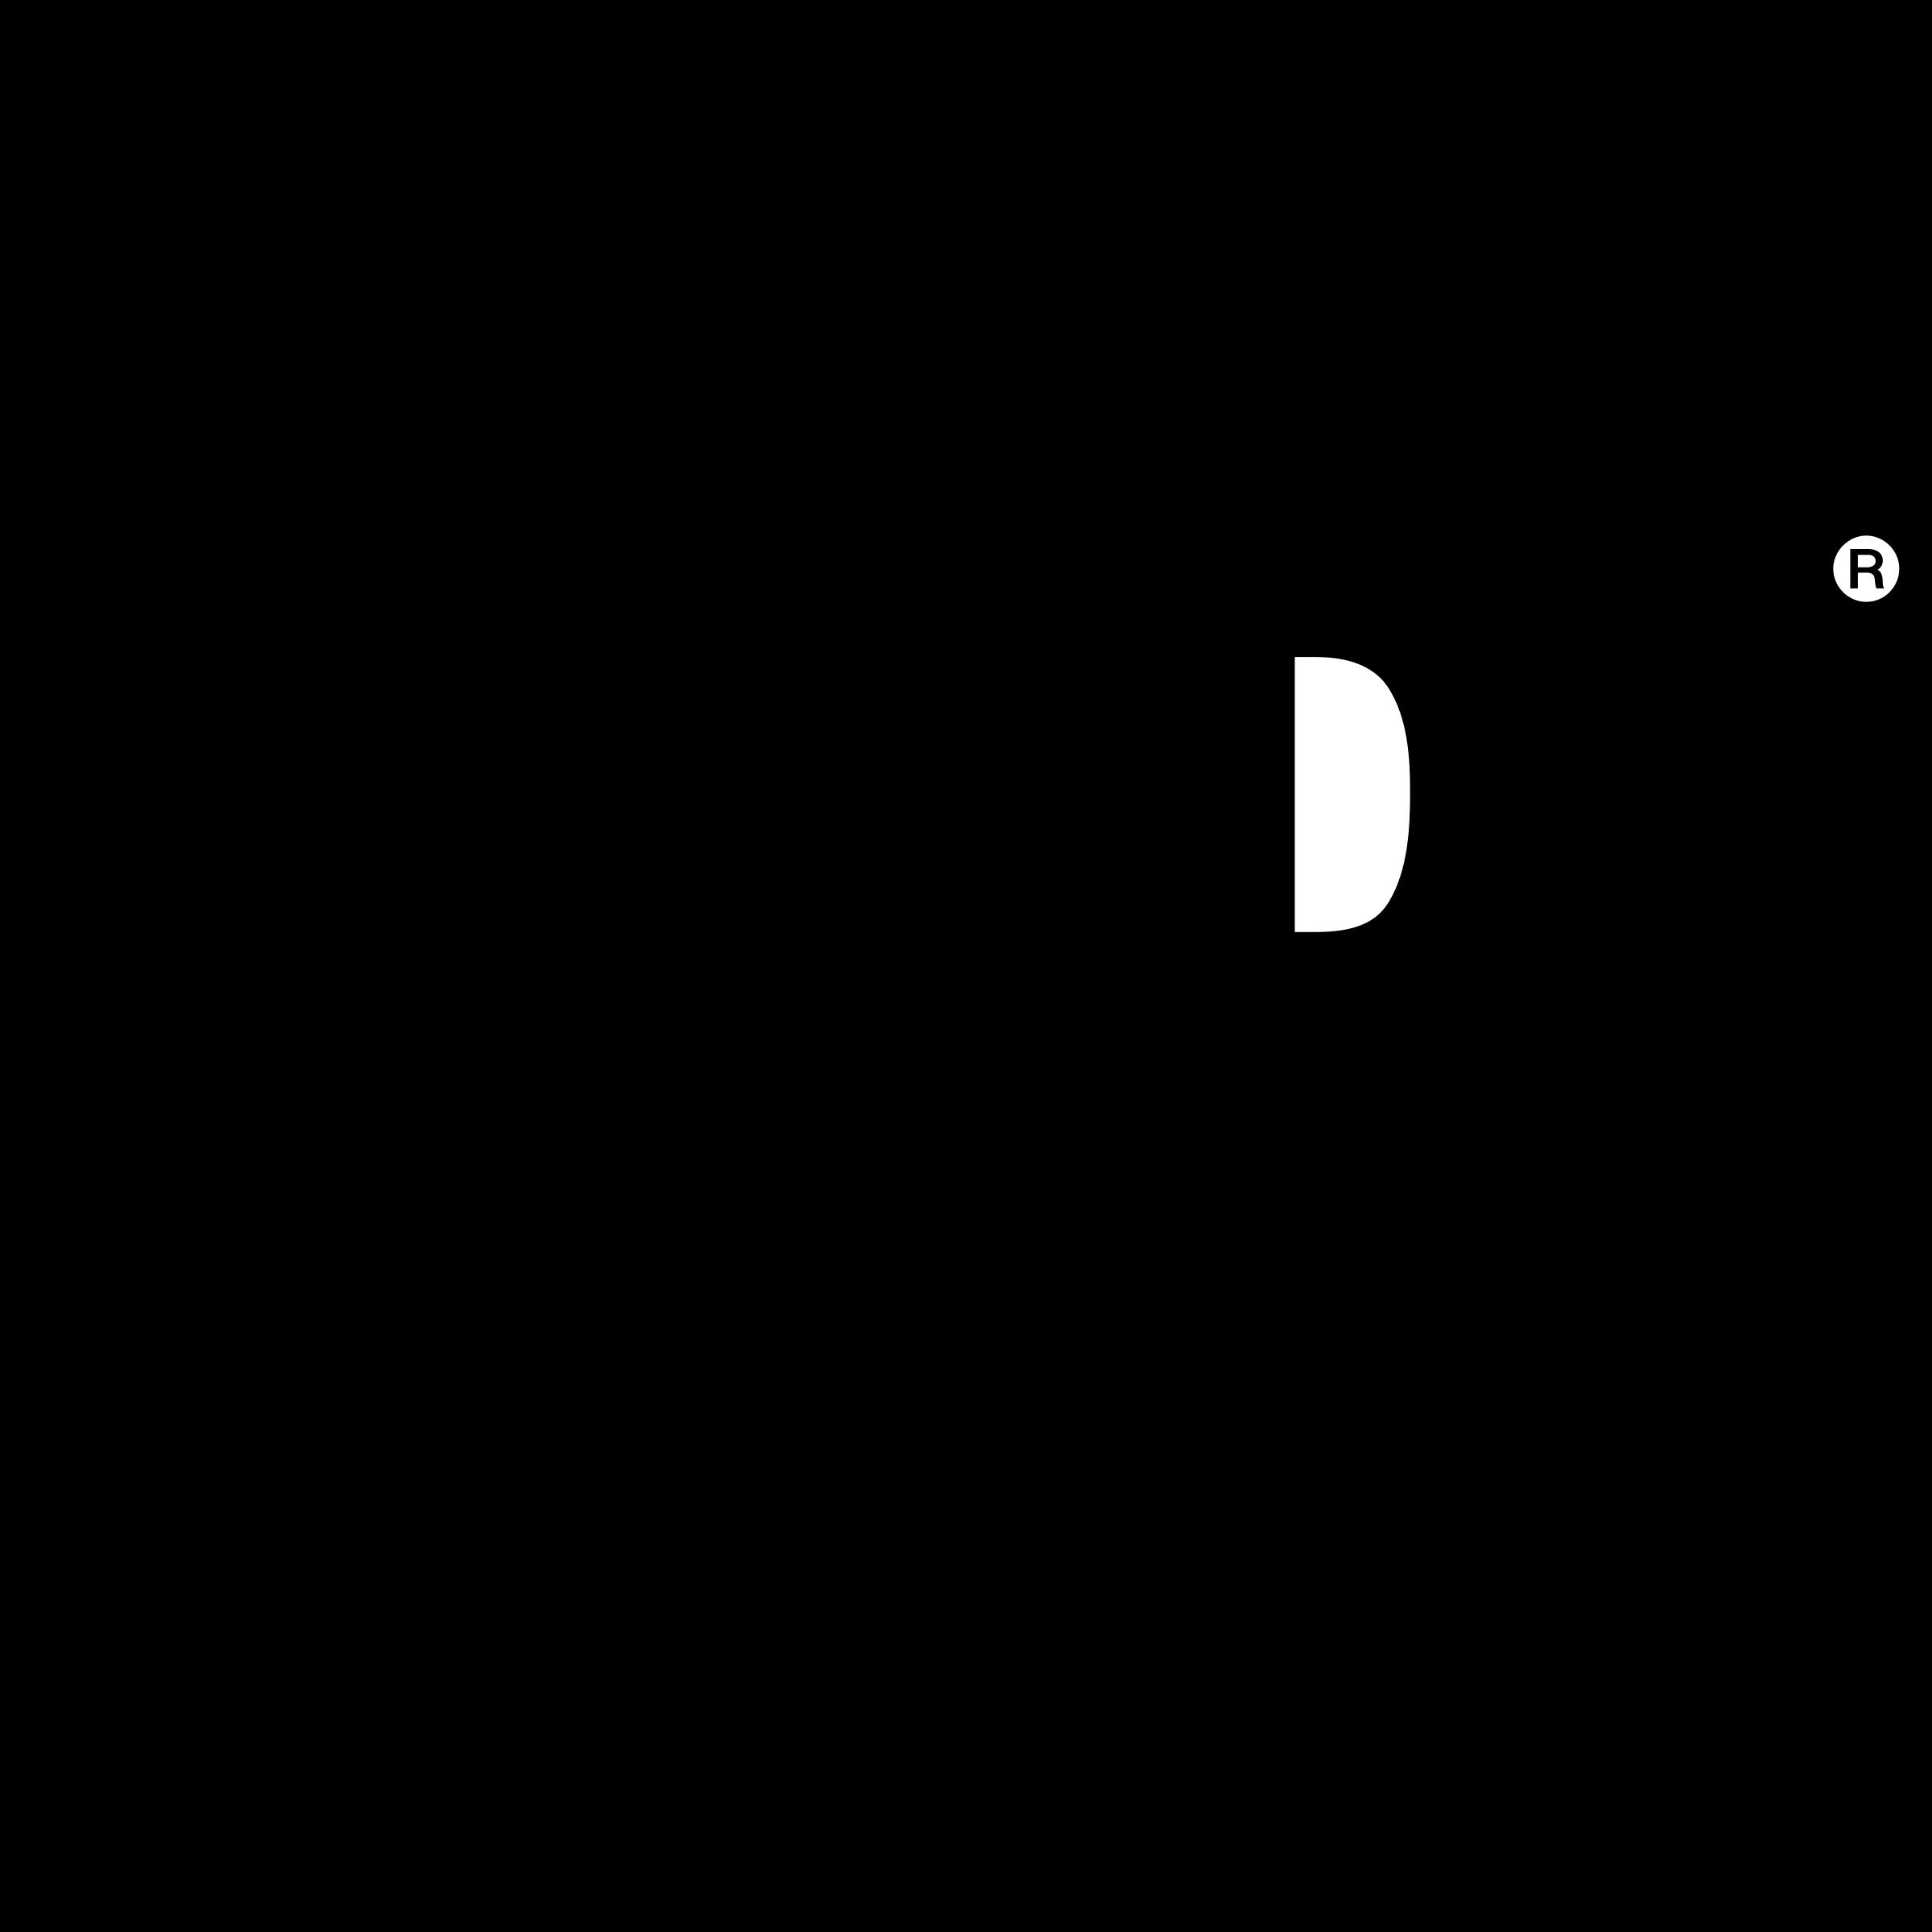 shape-logo-png-transparent.png